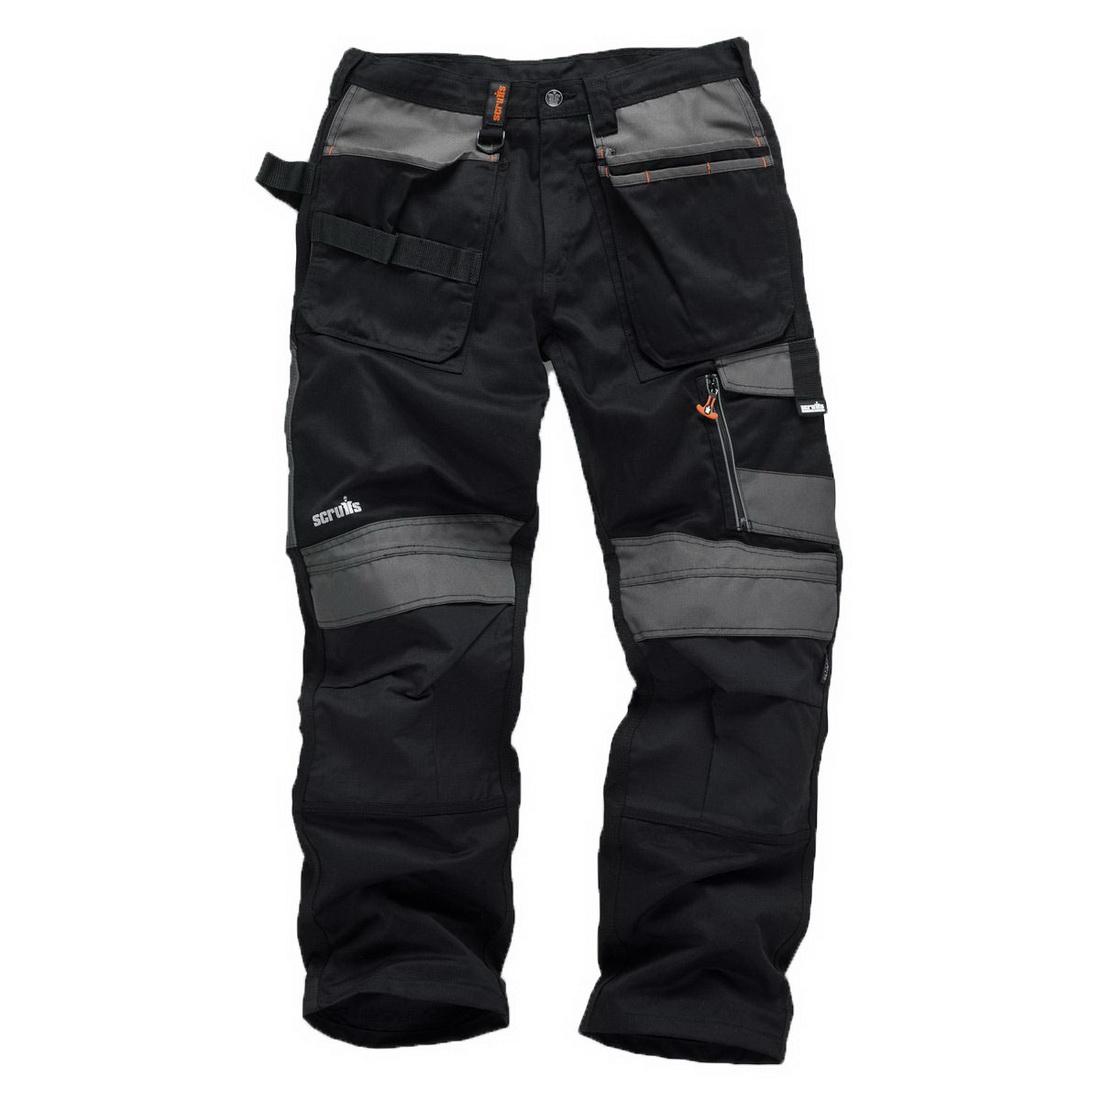 3D Trade Work Trouser 36in Black T51975